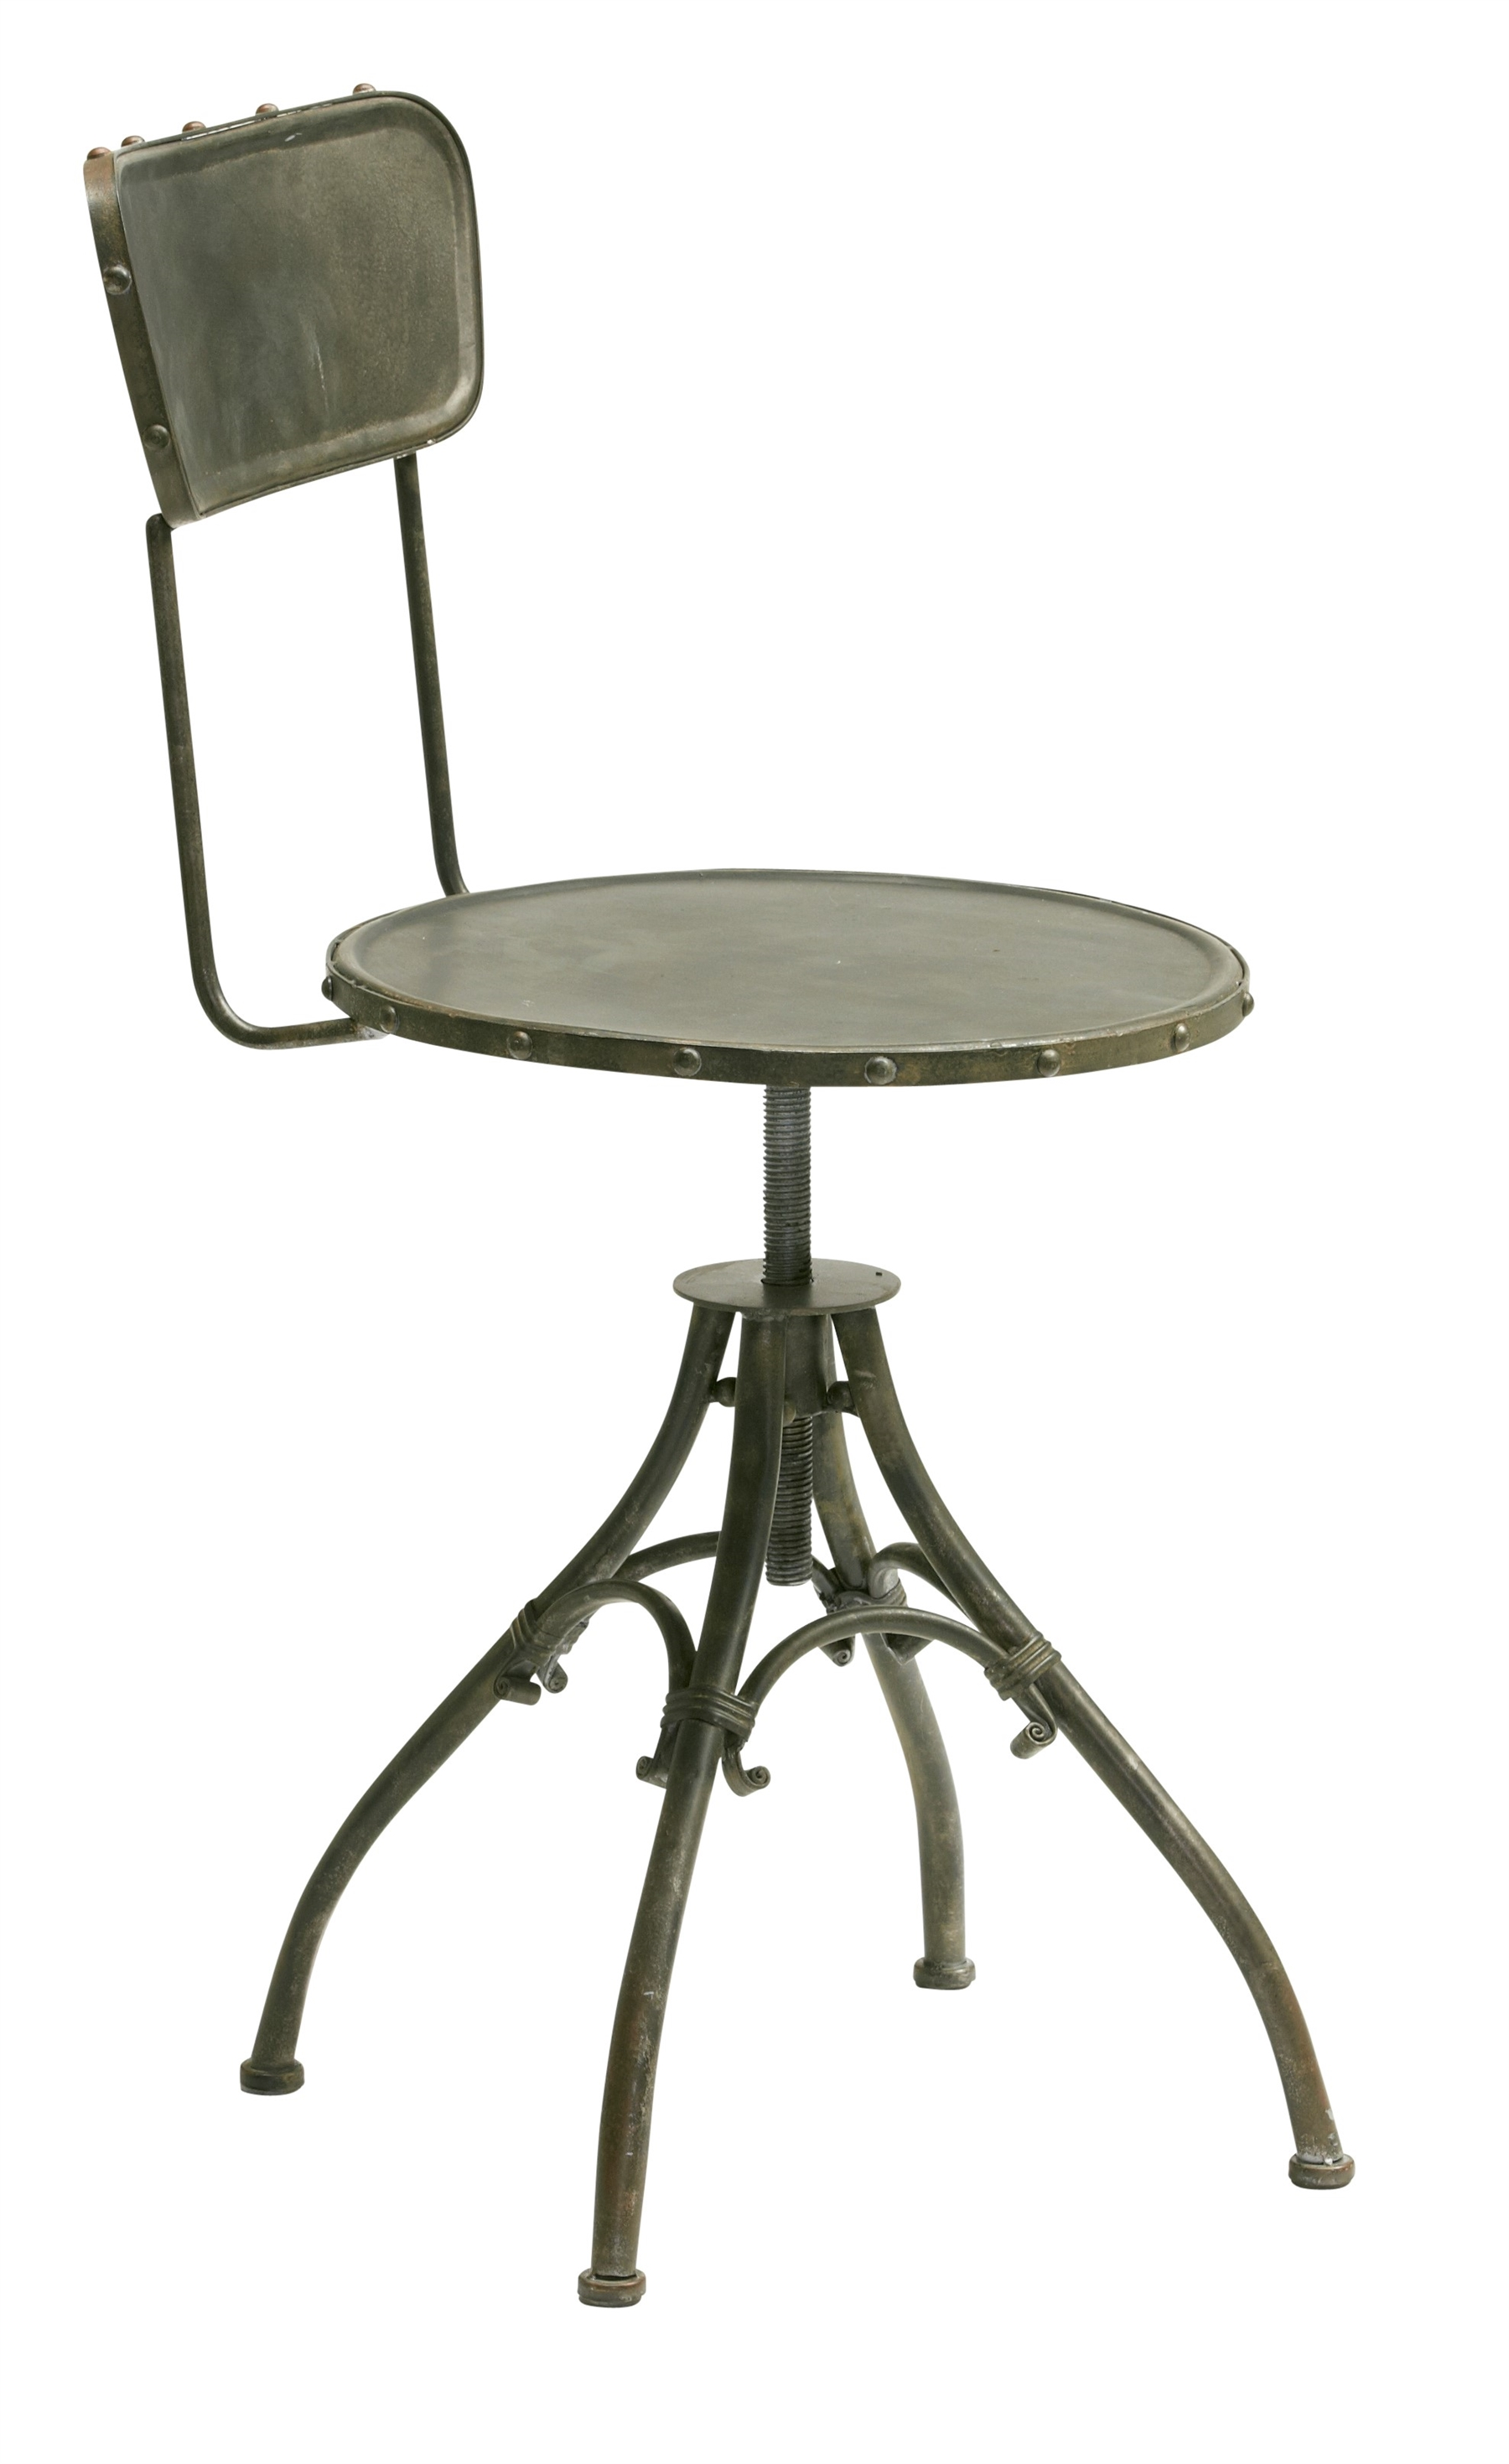 metal stol Metal dreje stol 41x78x46cm   Metal møbler   Metal stole metal stol